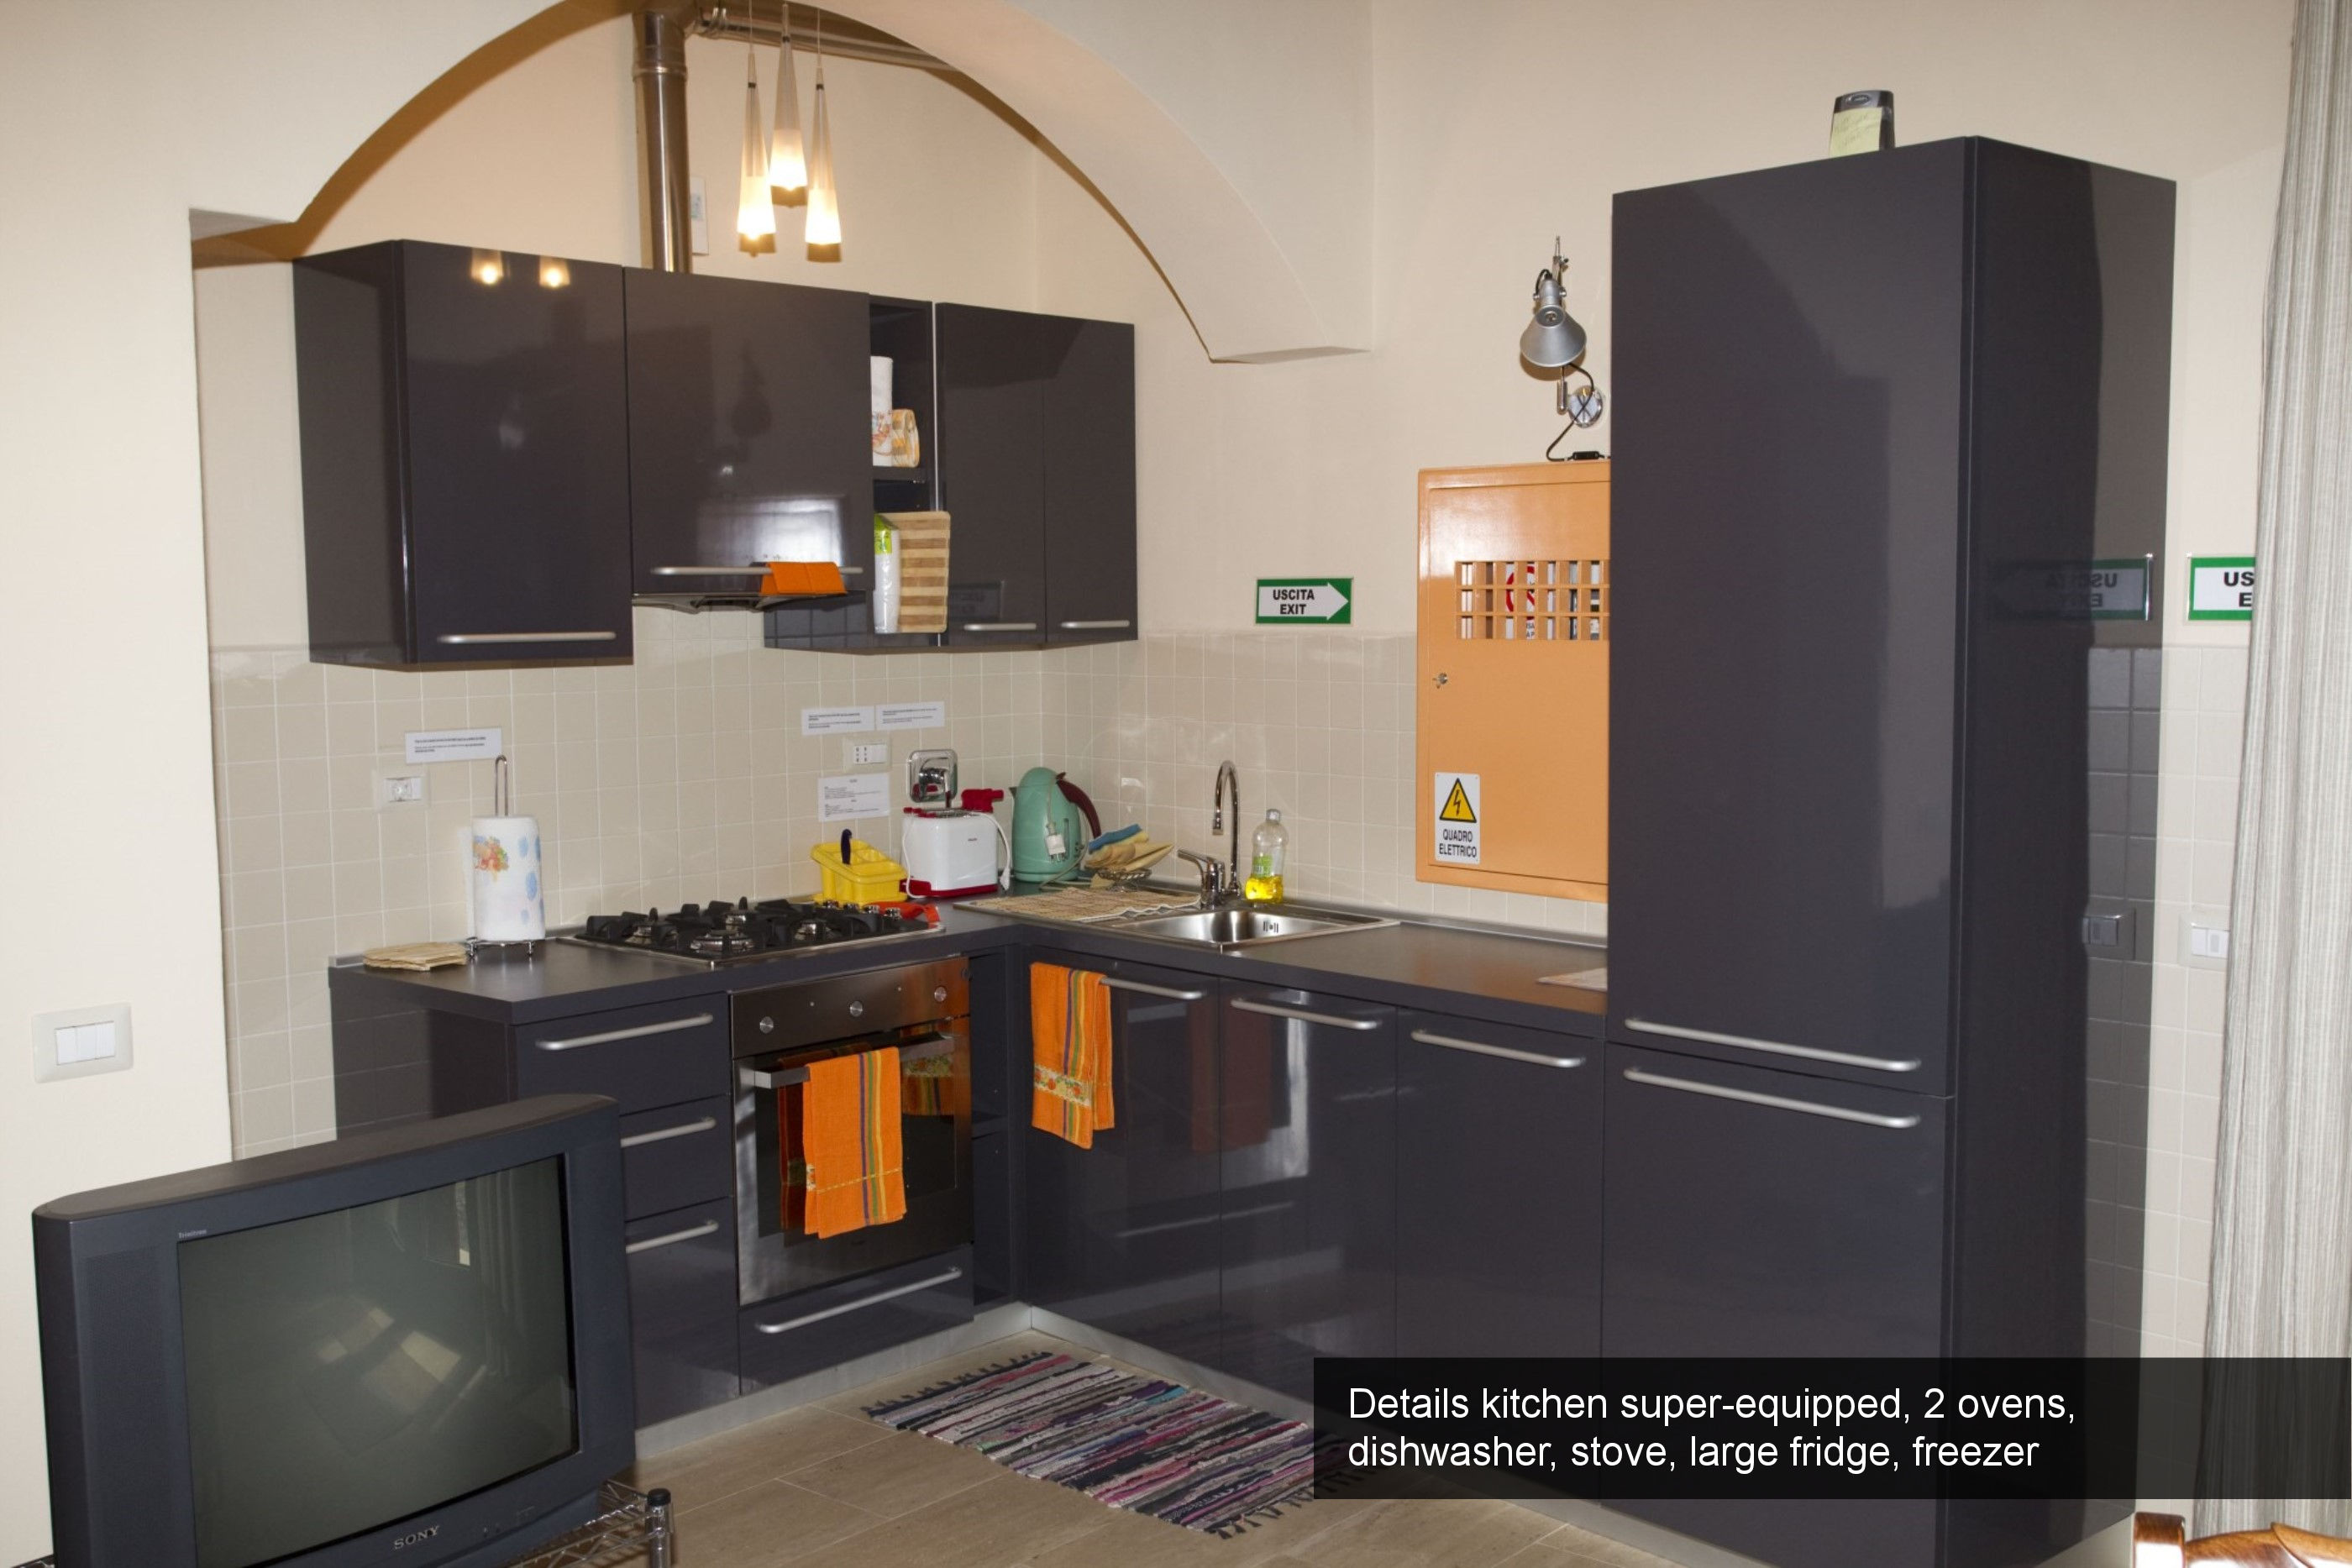 5) details kitchen super-equipped, 2 ovens, dishwasher, stove, large fri...